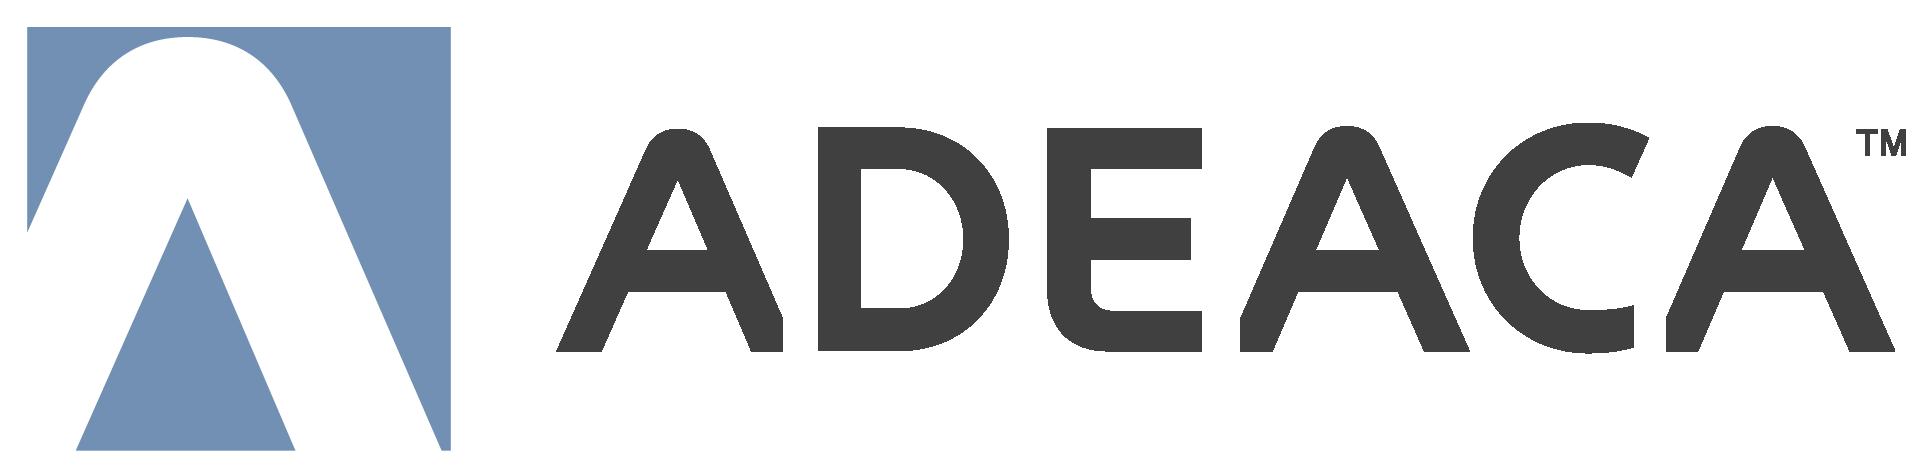 Matt Mong of Adeaca Interviewed on Robotics & Automation News Podcast